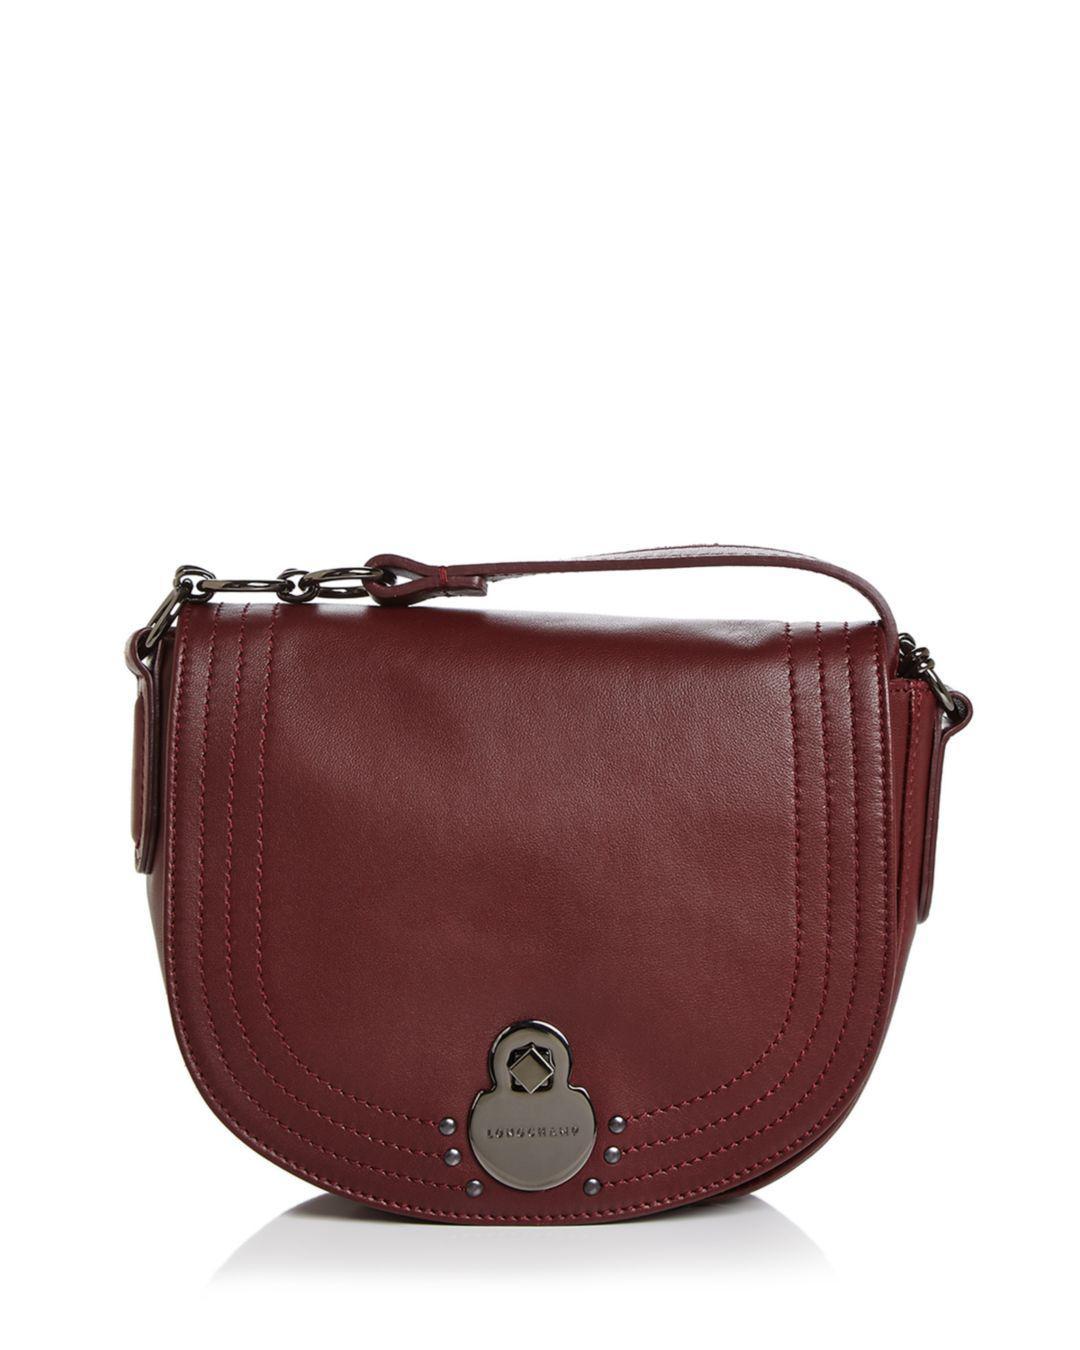 3a66722866e4 Lyst - Longchamp Cavalcade Small Leather Crossbody